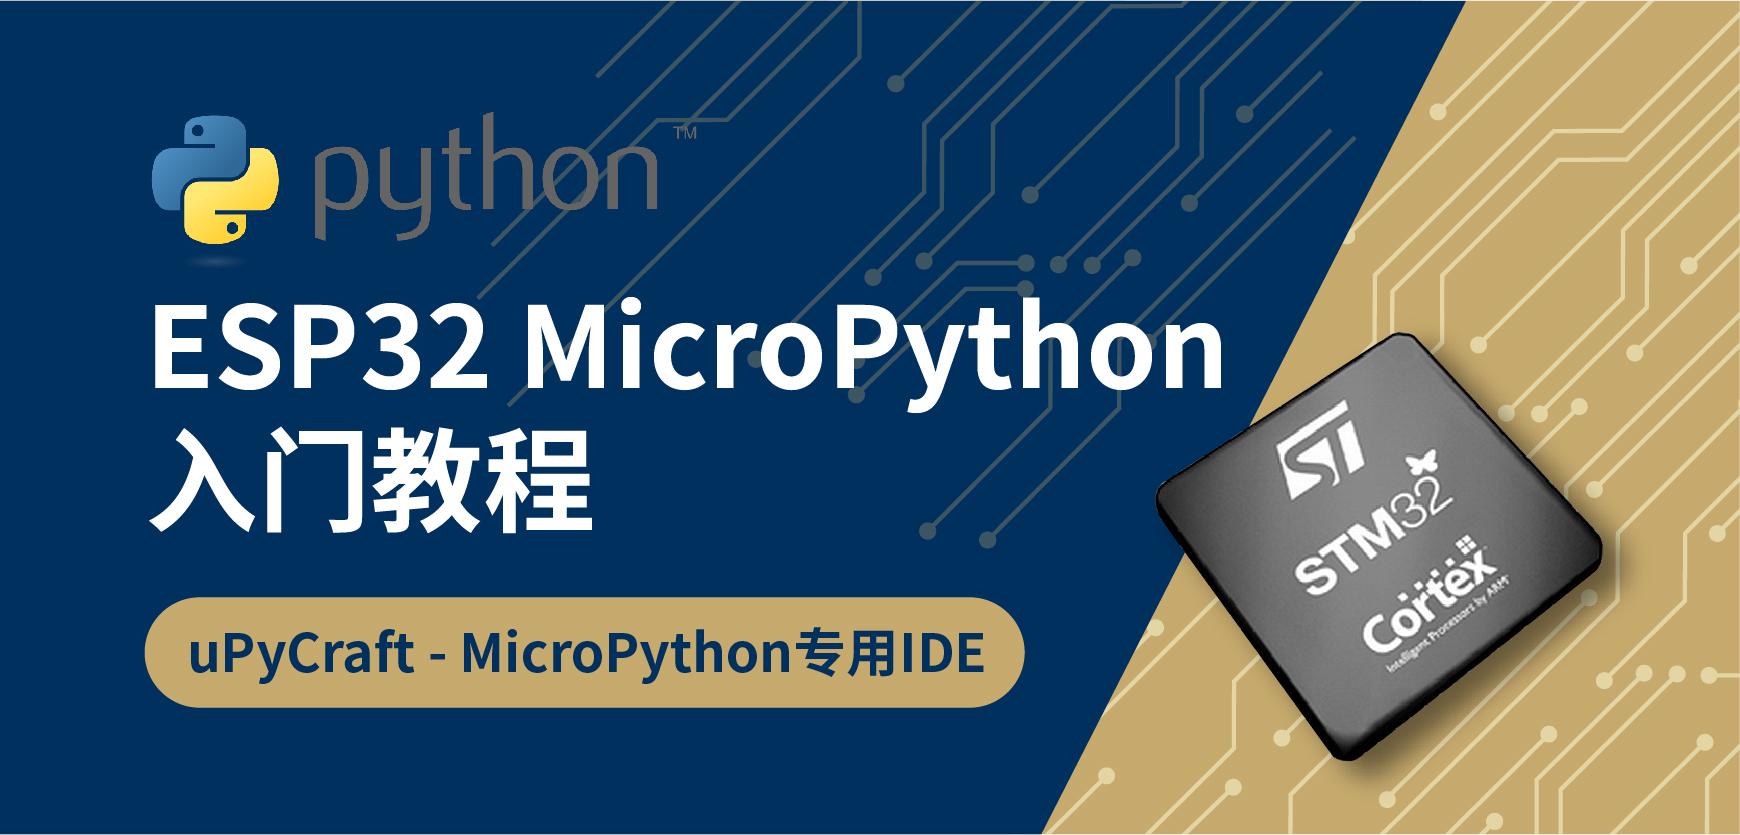 DFRobot最新创客活动-什么是MicroPyhthon?uPyCraft IDE编辑器